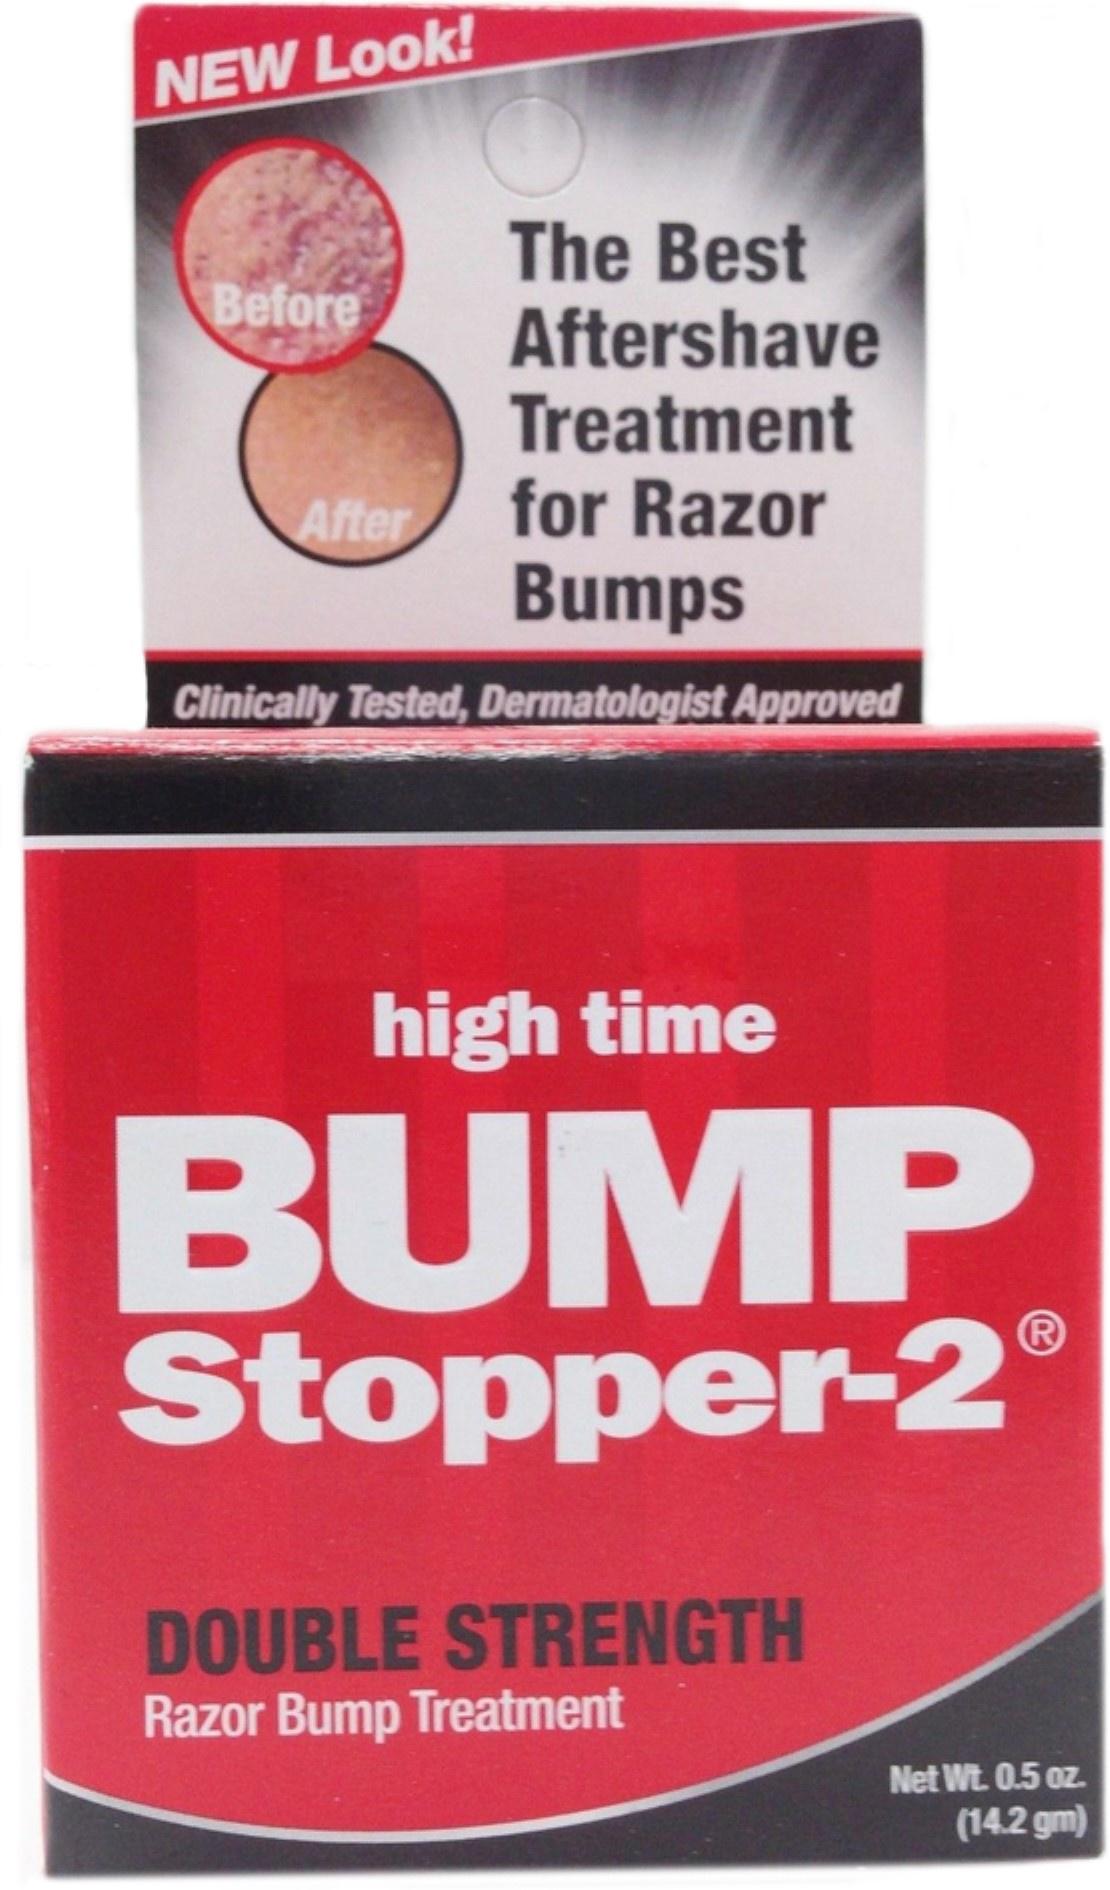 High Time Bump Stopper-2 Double Strength Razor Bump Treatment